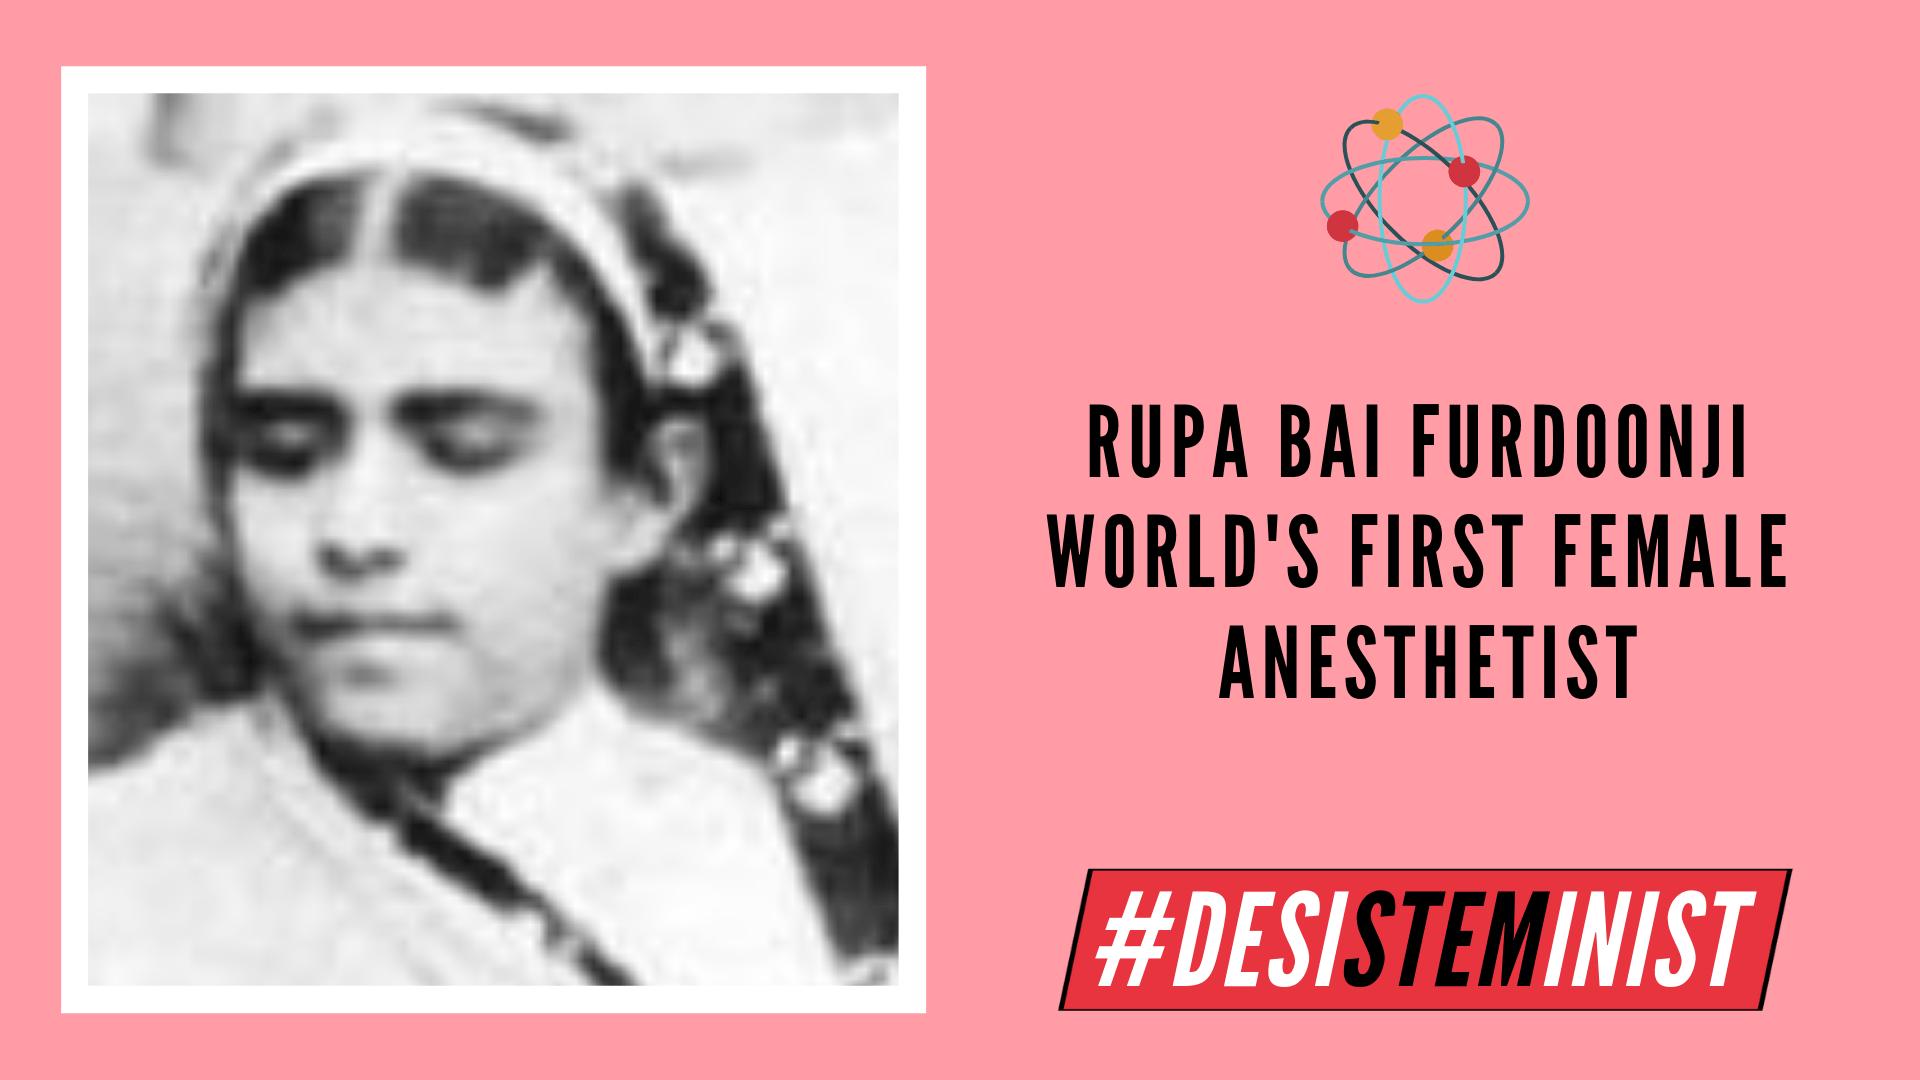 Rupa Bai Furdoonji: World's First Female Anesthetist | #DesiSTEMinist